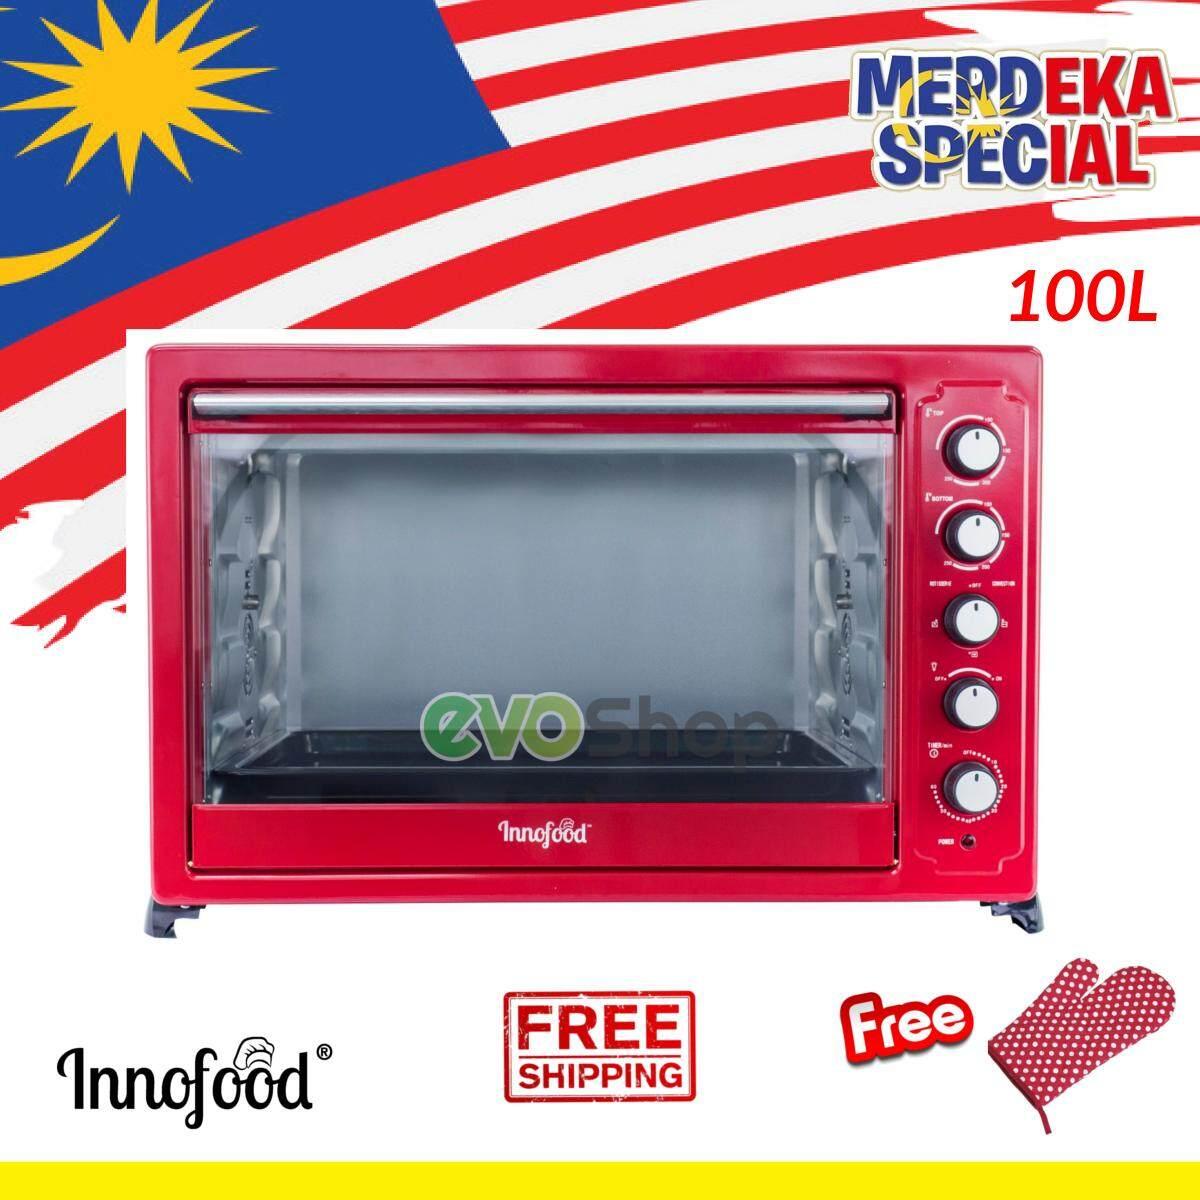 (FREE Gift!) INNOFOOD Independent Temperature Control Large Big Electric Oven KT-CL100R (100 Liter) Red Ketuhar Elektrik